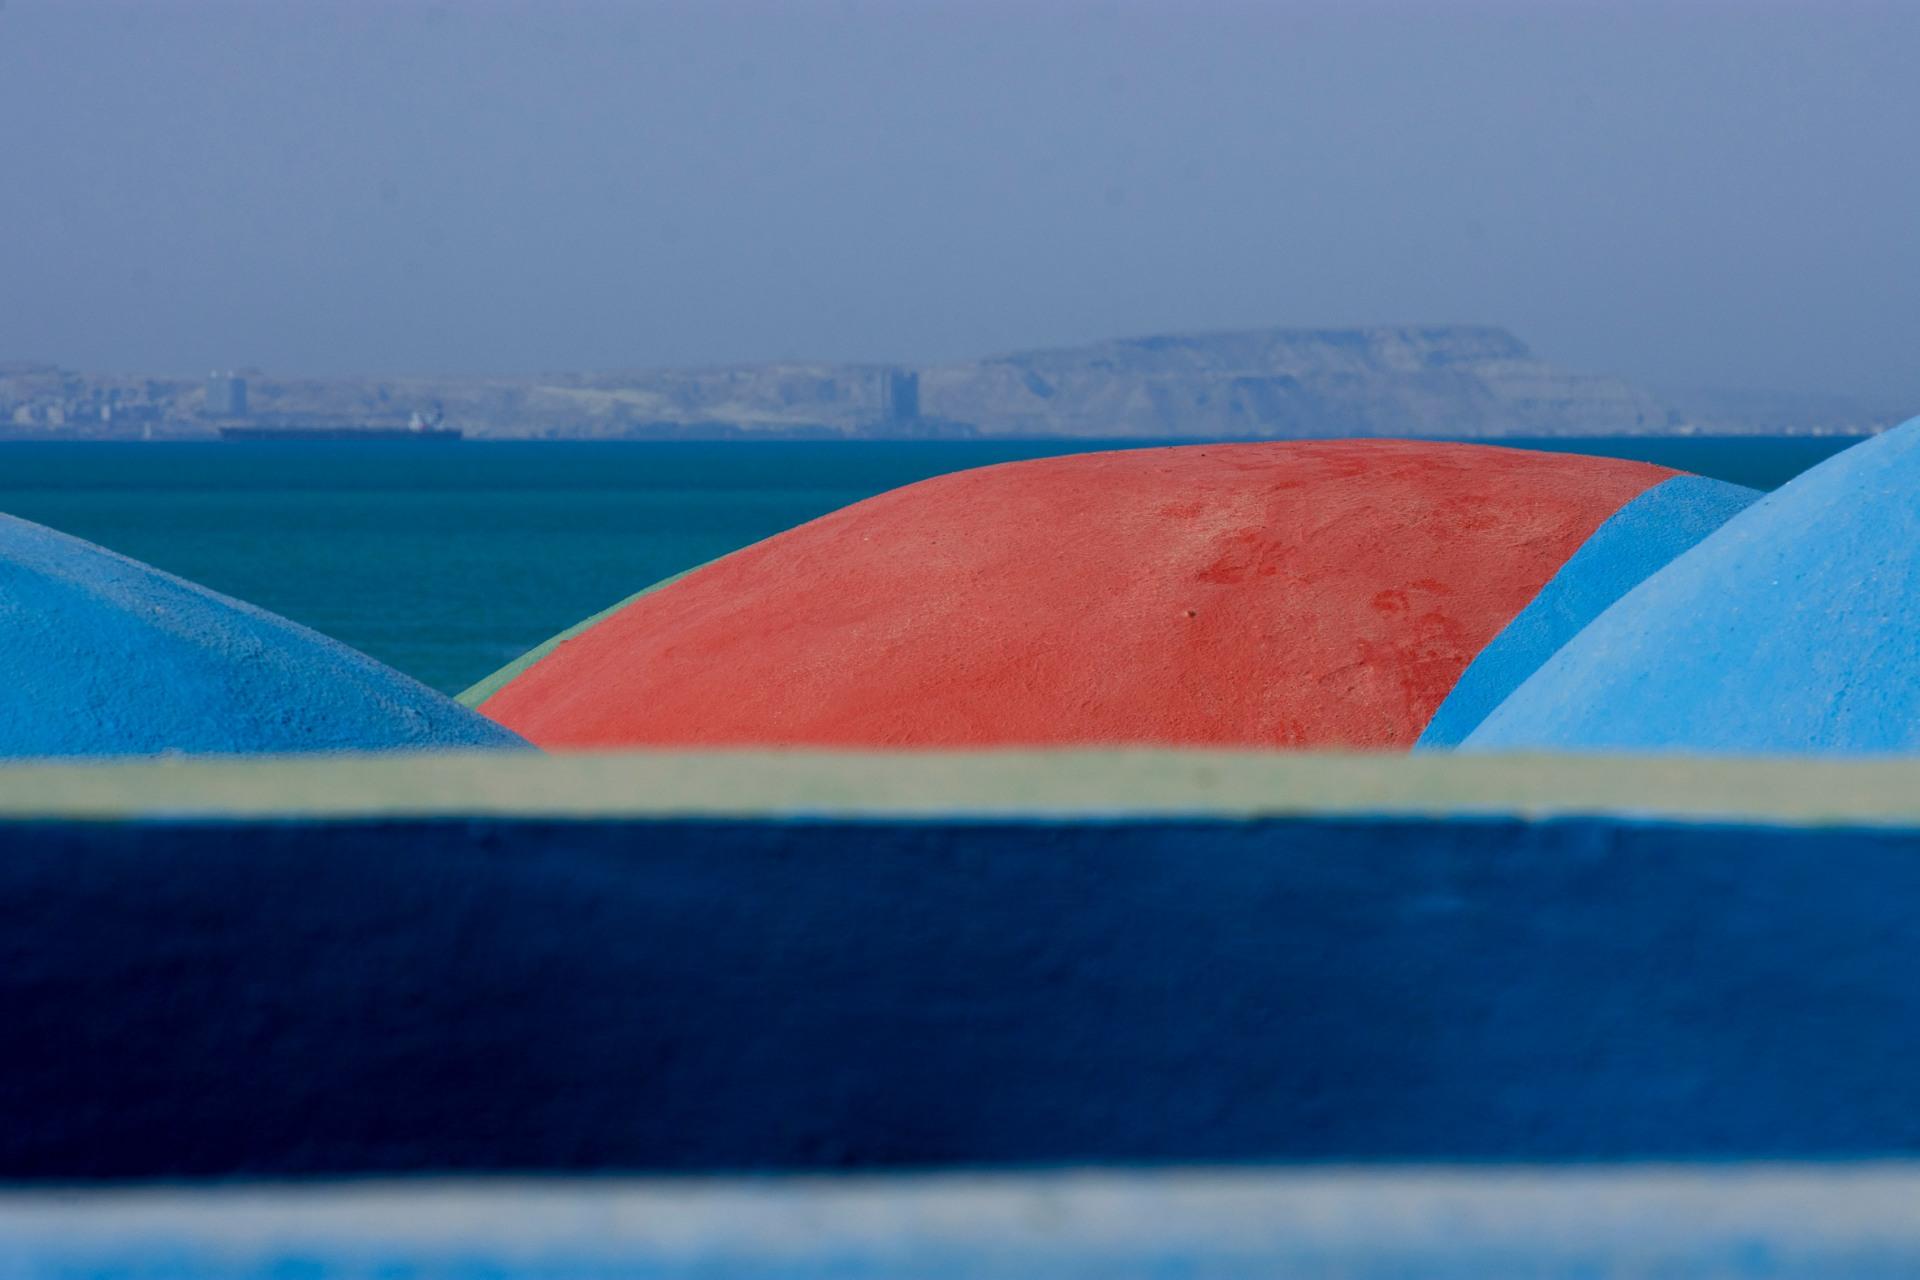 zav_architects_iran_hormuz_island_designalive-14